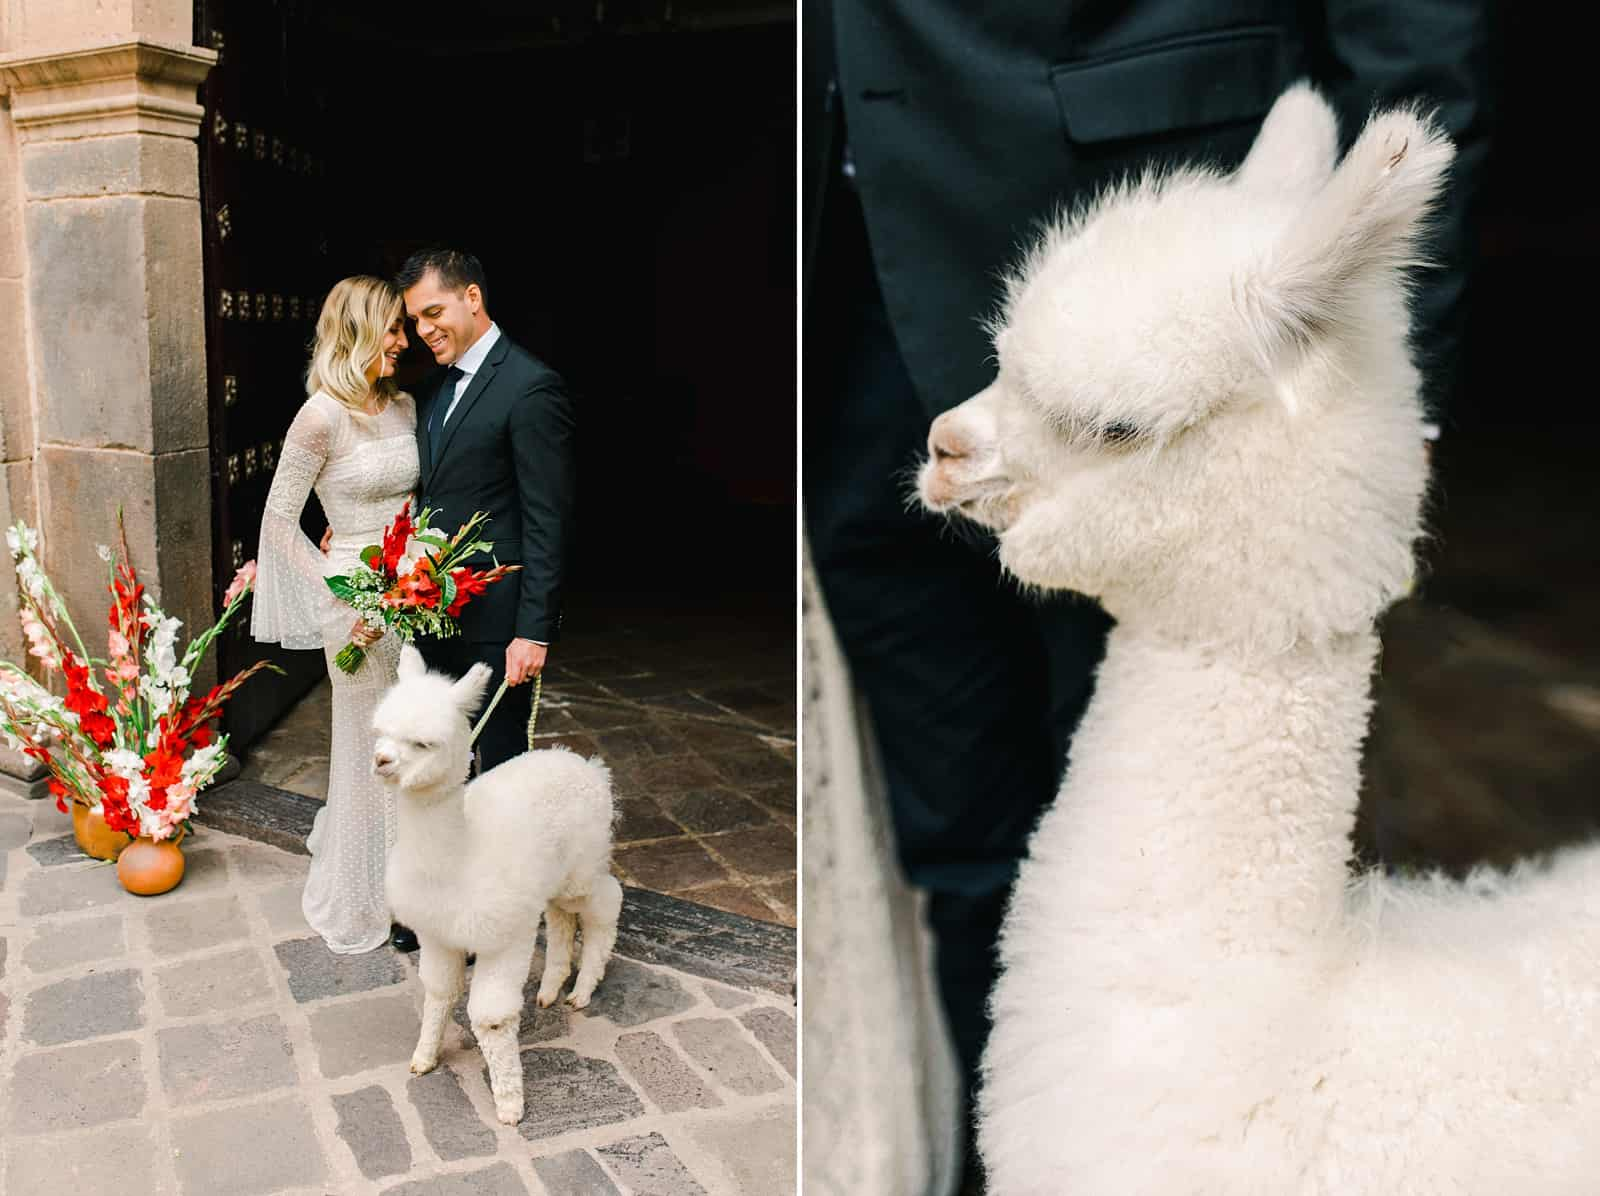 Cusco Peru Destination Wedding, travel wedding photography, Plaza de Armas red flowers boho wedding, bride and groom with white alpaca llama